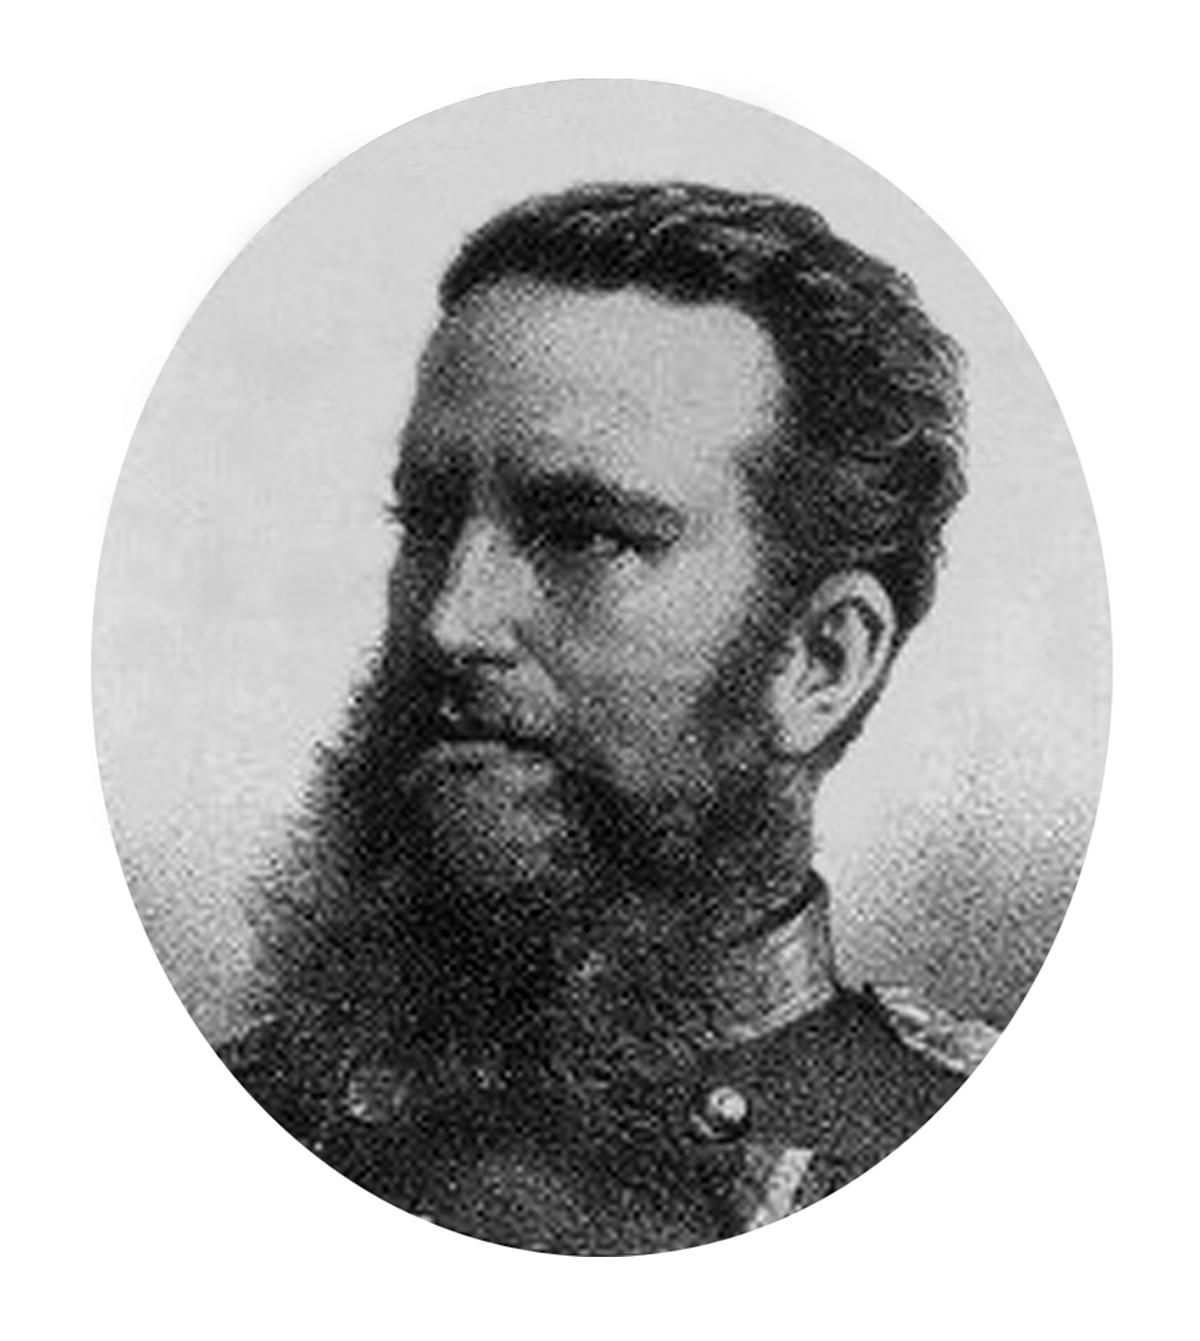 http://hrvatskifokus-2021.ga/wp-content/uploads/2018/11/Pukovnik_Antonije.Ante_V._Oreskovic_1829-1906_Srbin_katolik_iz_Vojne_krajine.jpg